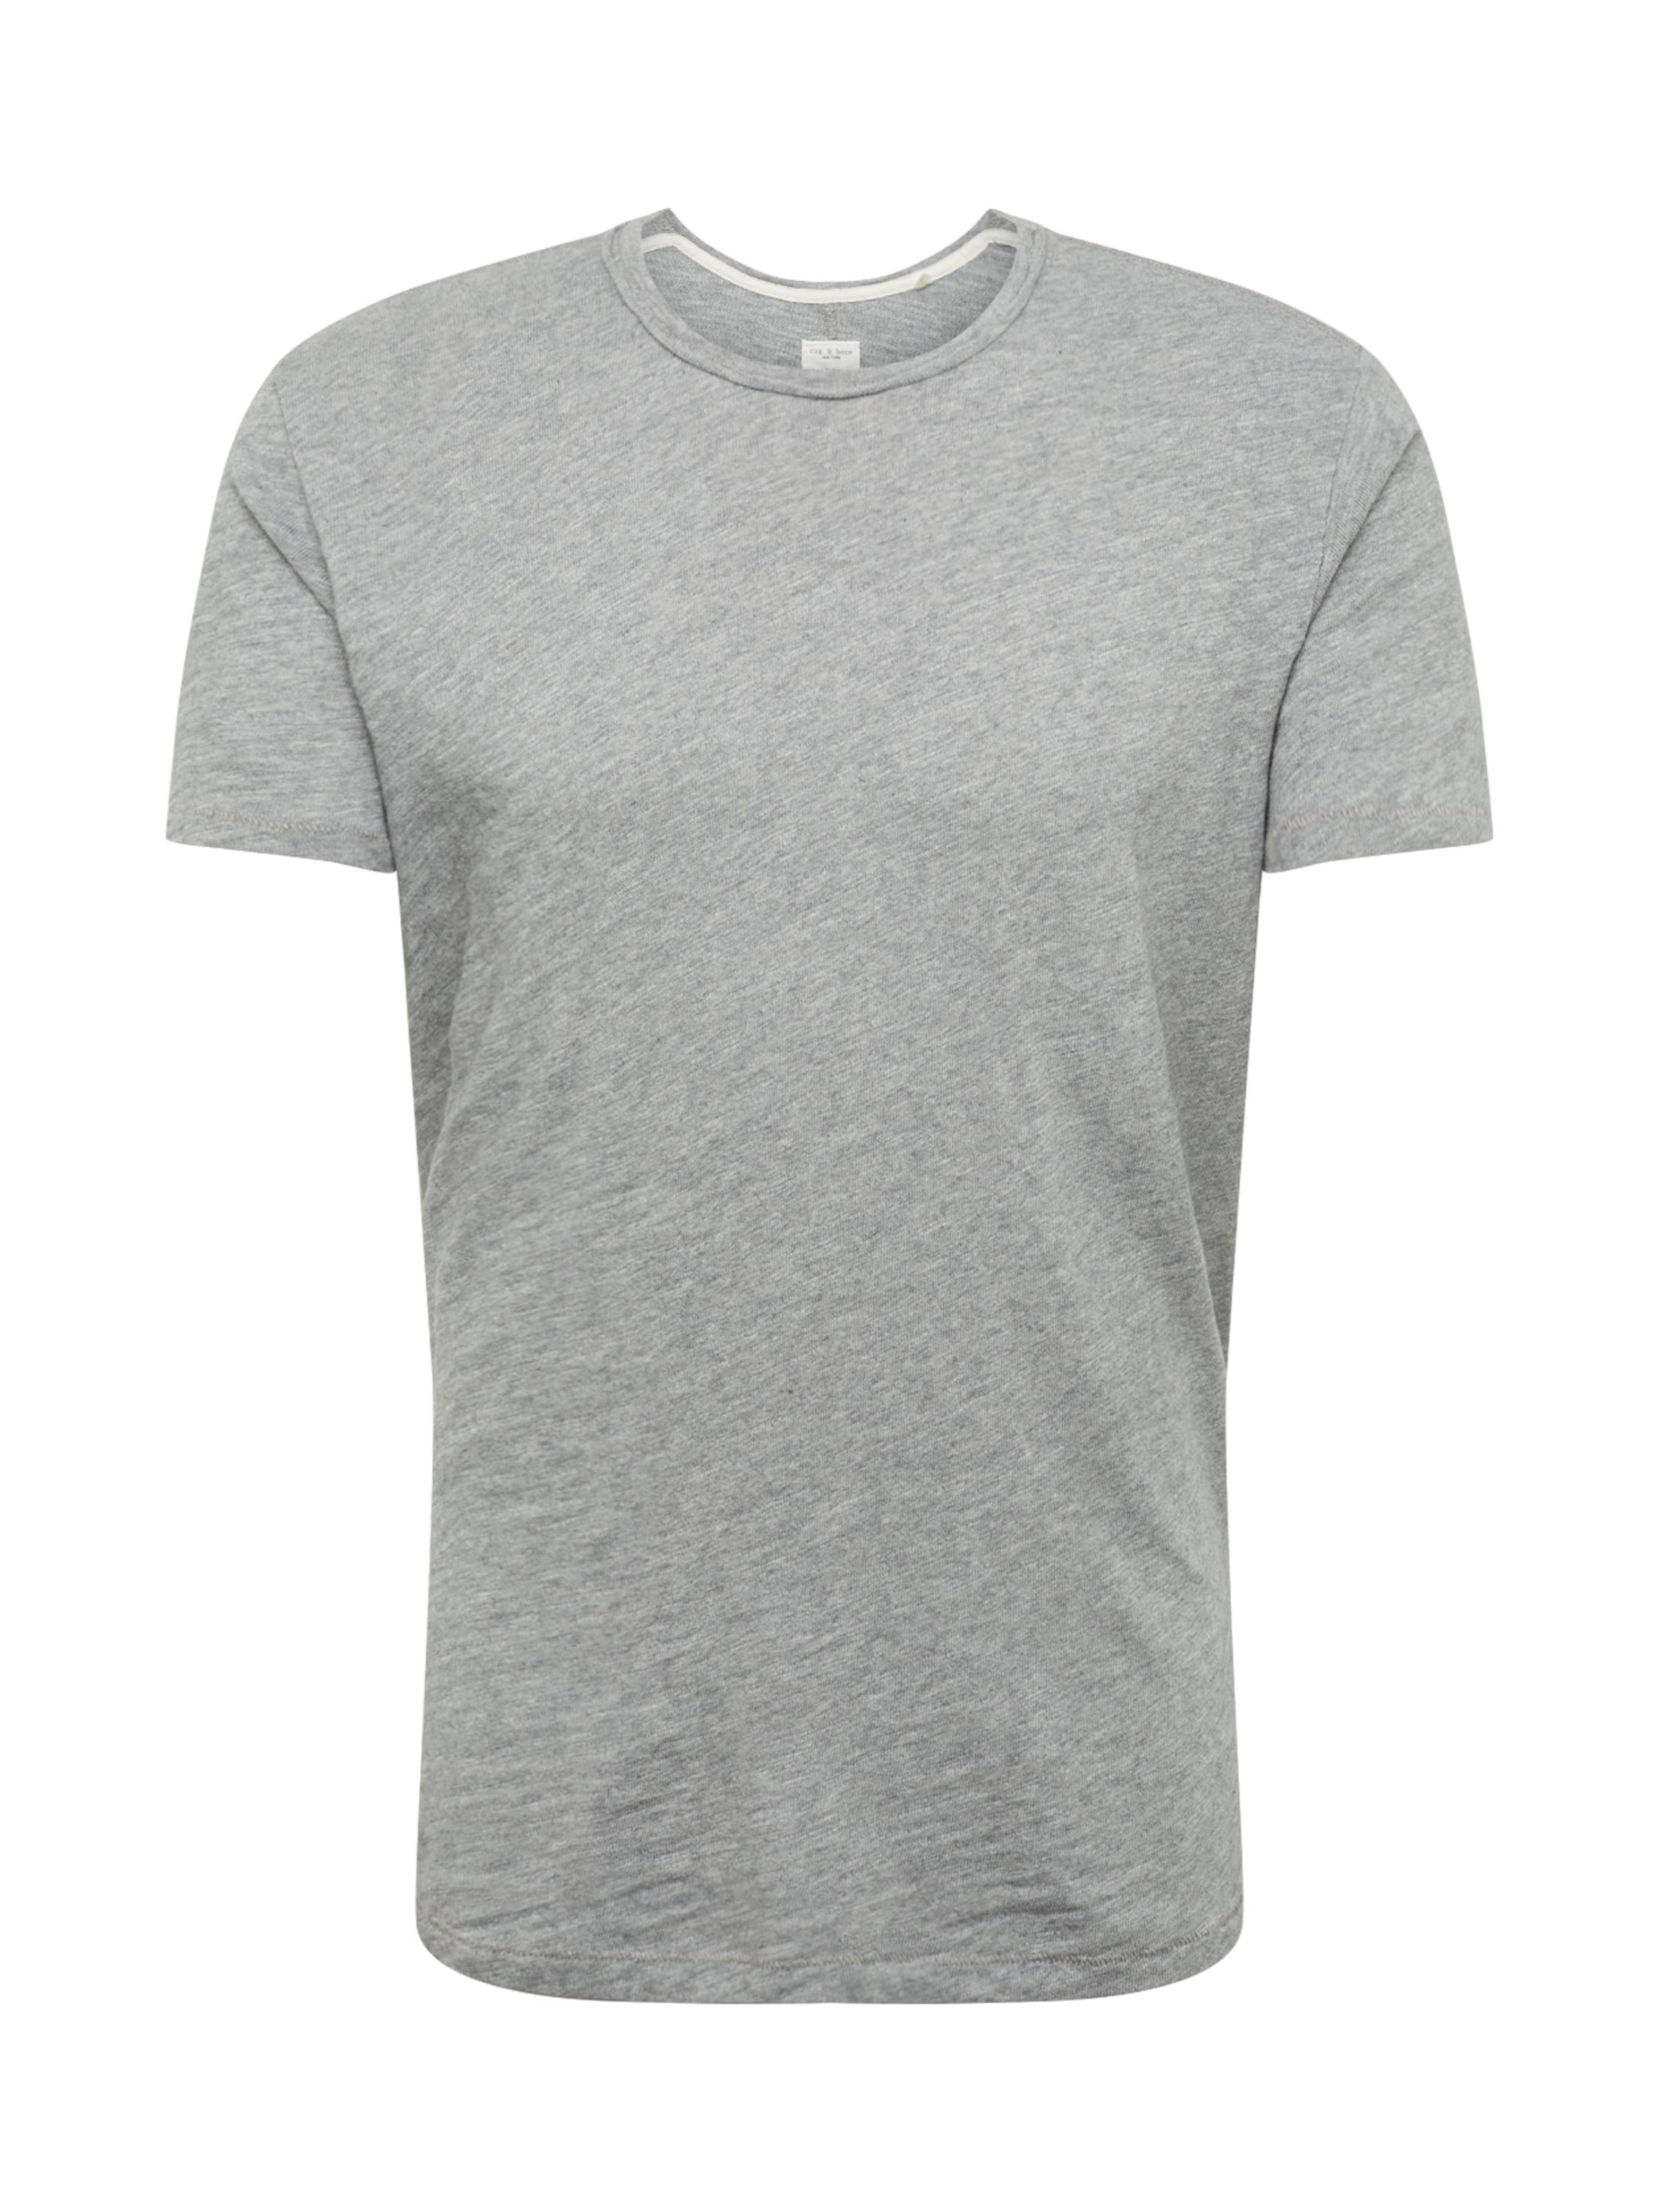 En Gris Ragamp; Tee' shirt 'rgb T Bone Classic b6g7fy